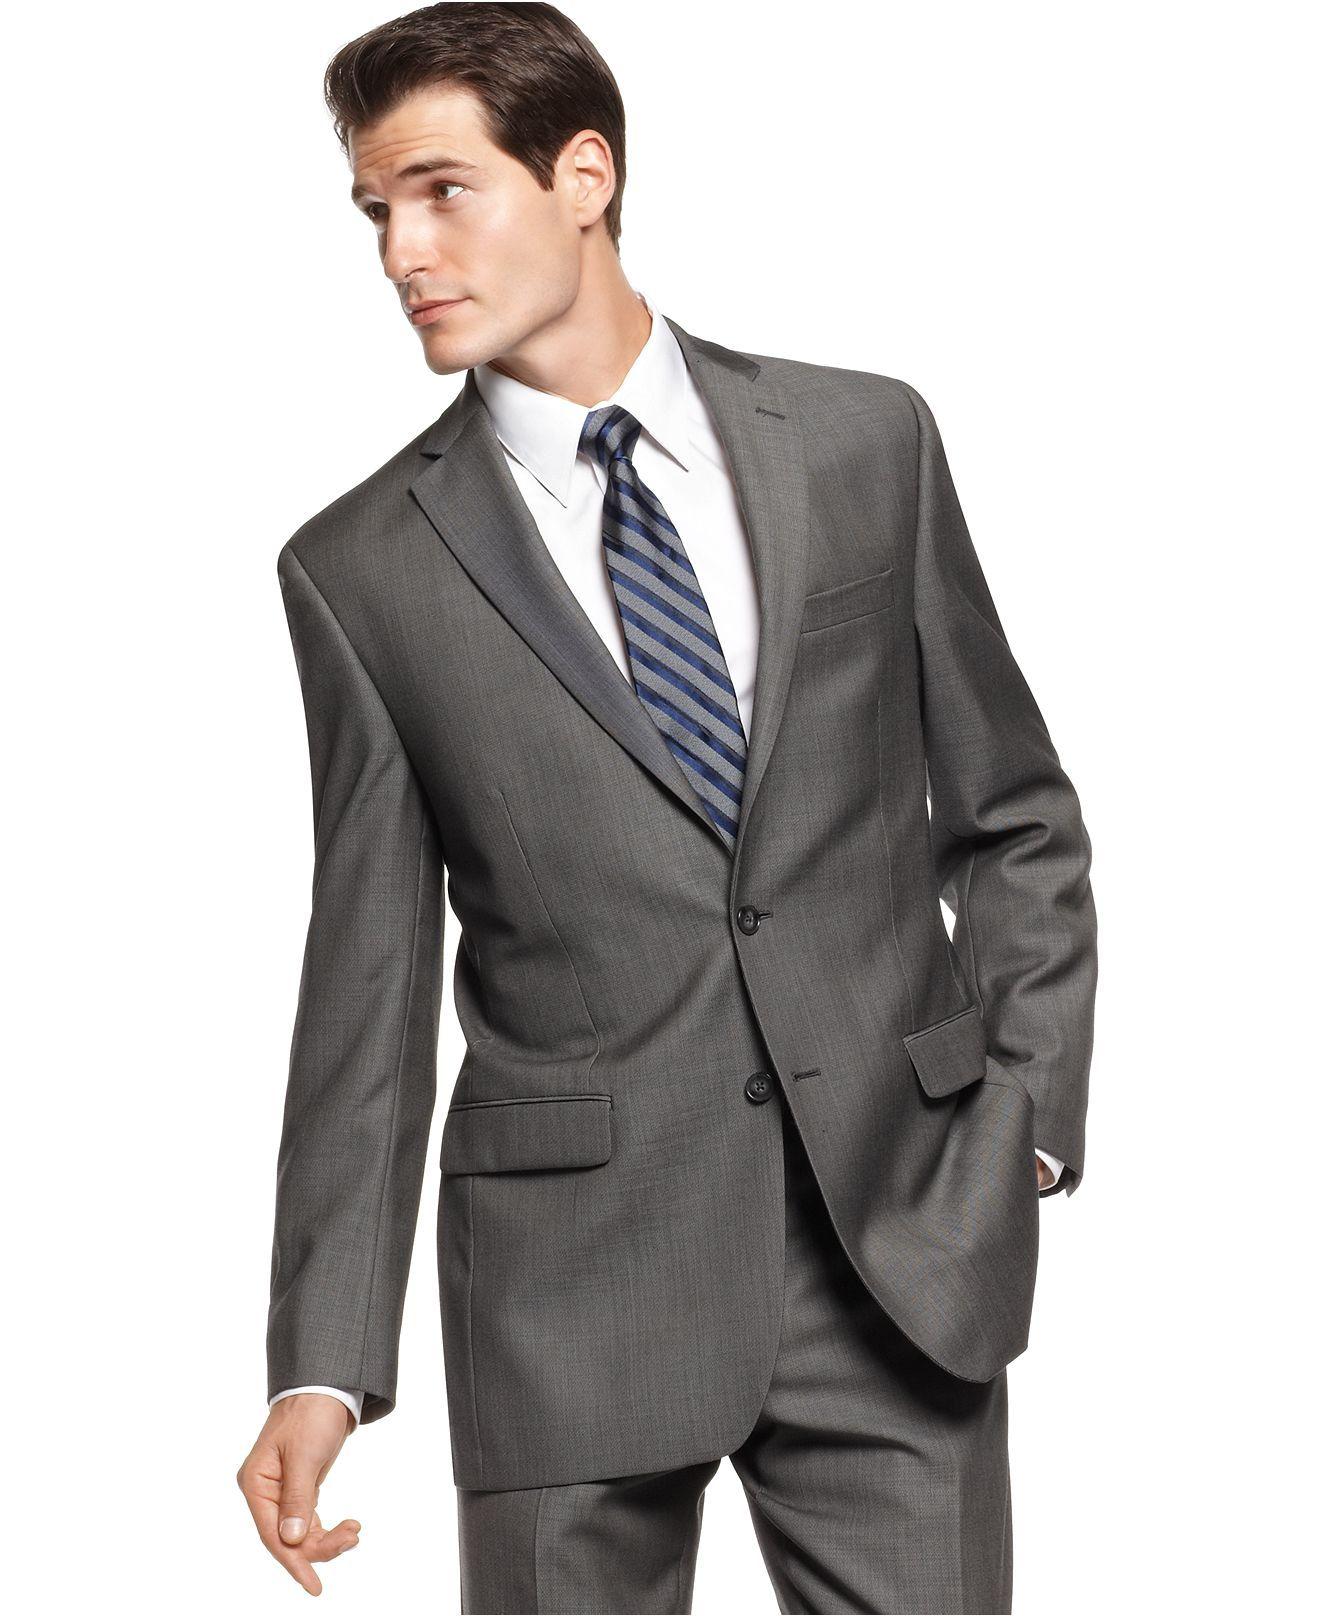 9fc89fa99c5f Calvin Klein Jacket, Charcoal Pindot Slim Fit Blazer - Mens Suits & Suit  Separates - Macy's